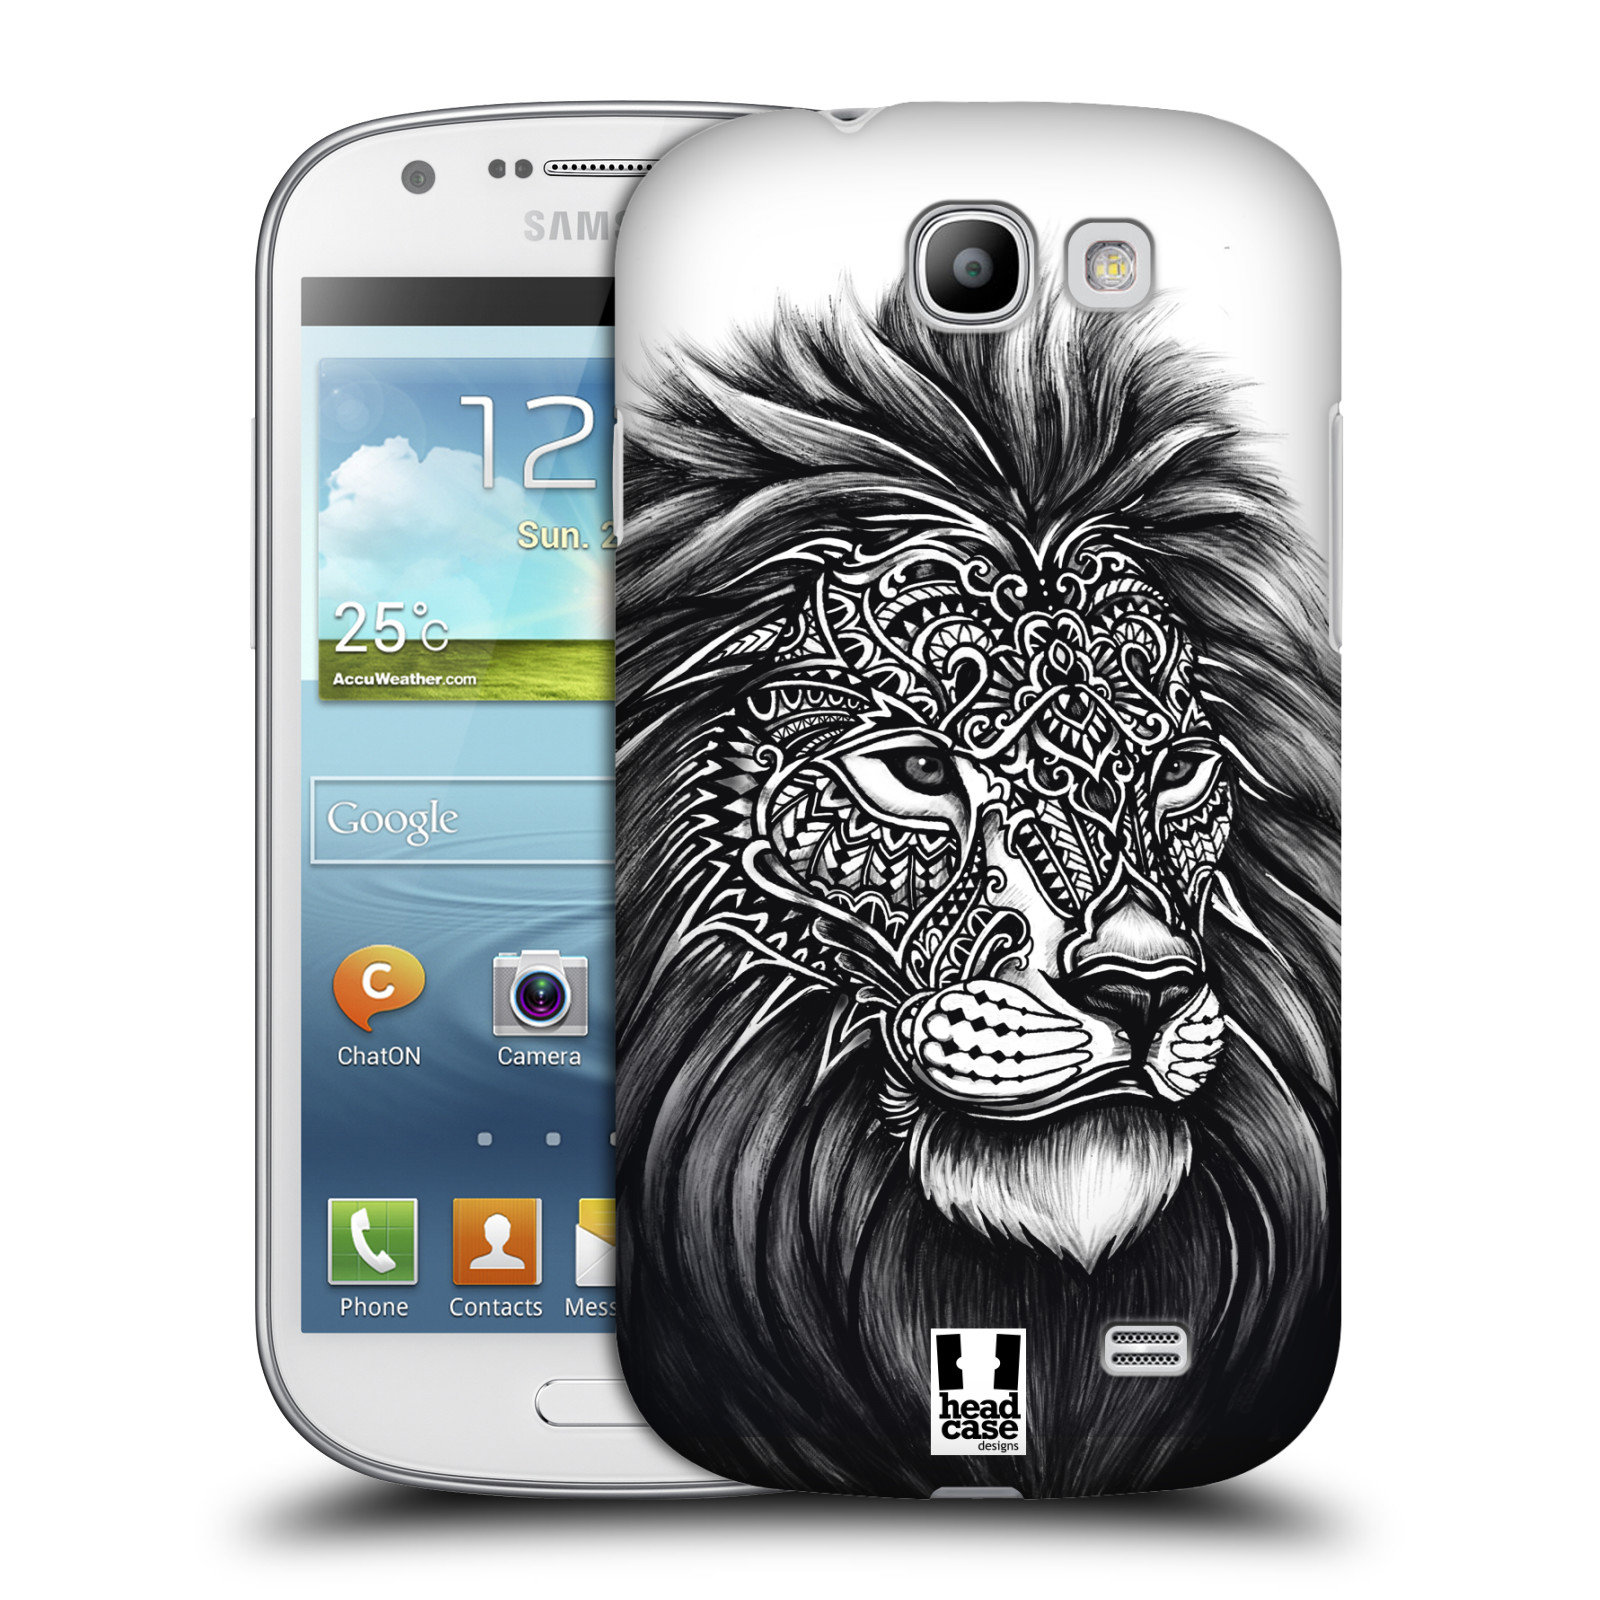 Plastové pouzdro na mobil Samsung Galaxy Express HEAD CASE Zdobený Lev (Plastový kryt či obal na mobilní telefon Samsung Galaxy Express GT-i8730)